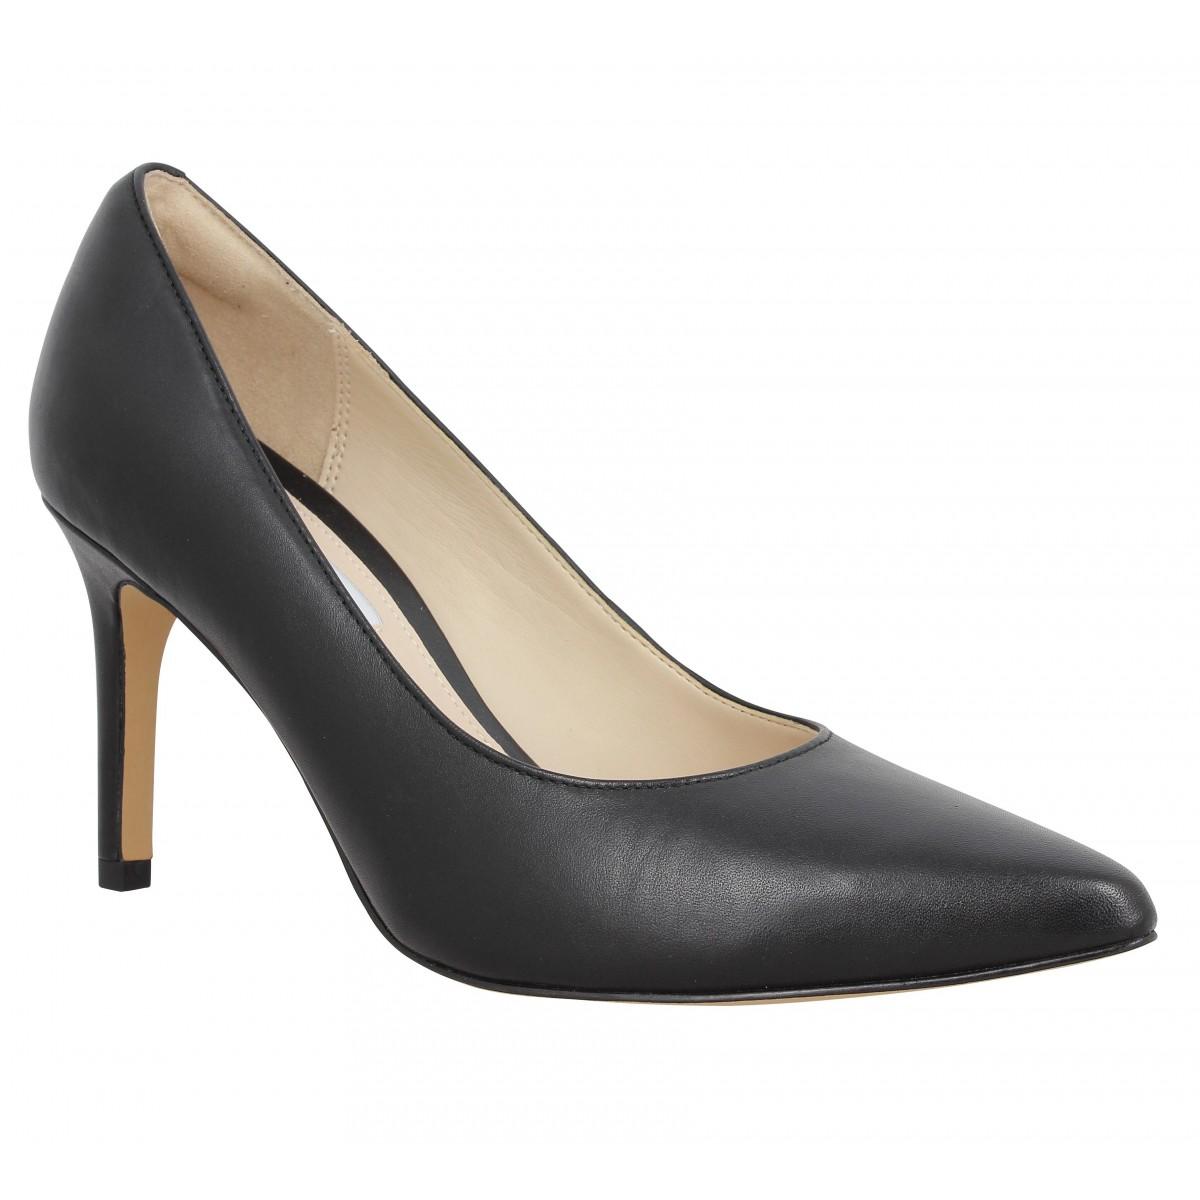 Escarpins CLARKS Dinah Keer cuir Noir